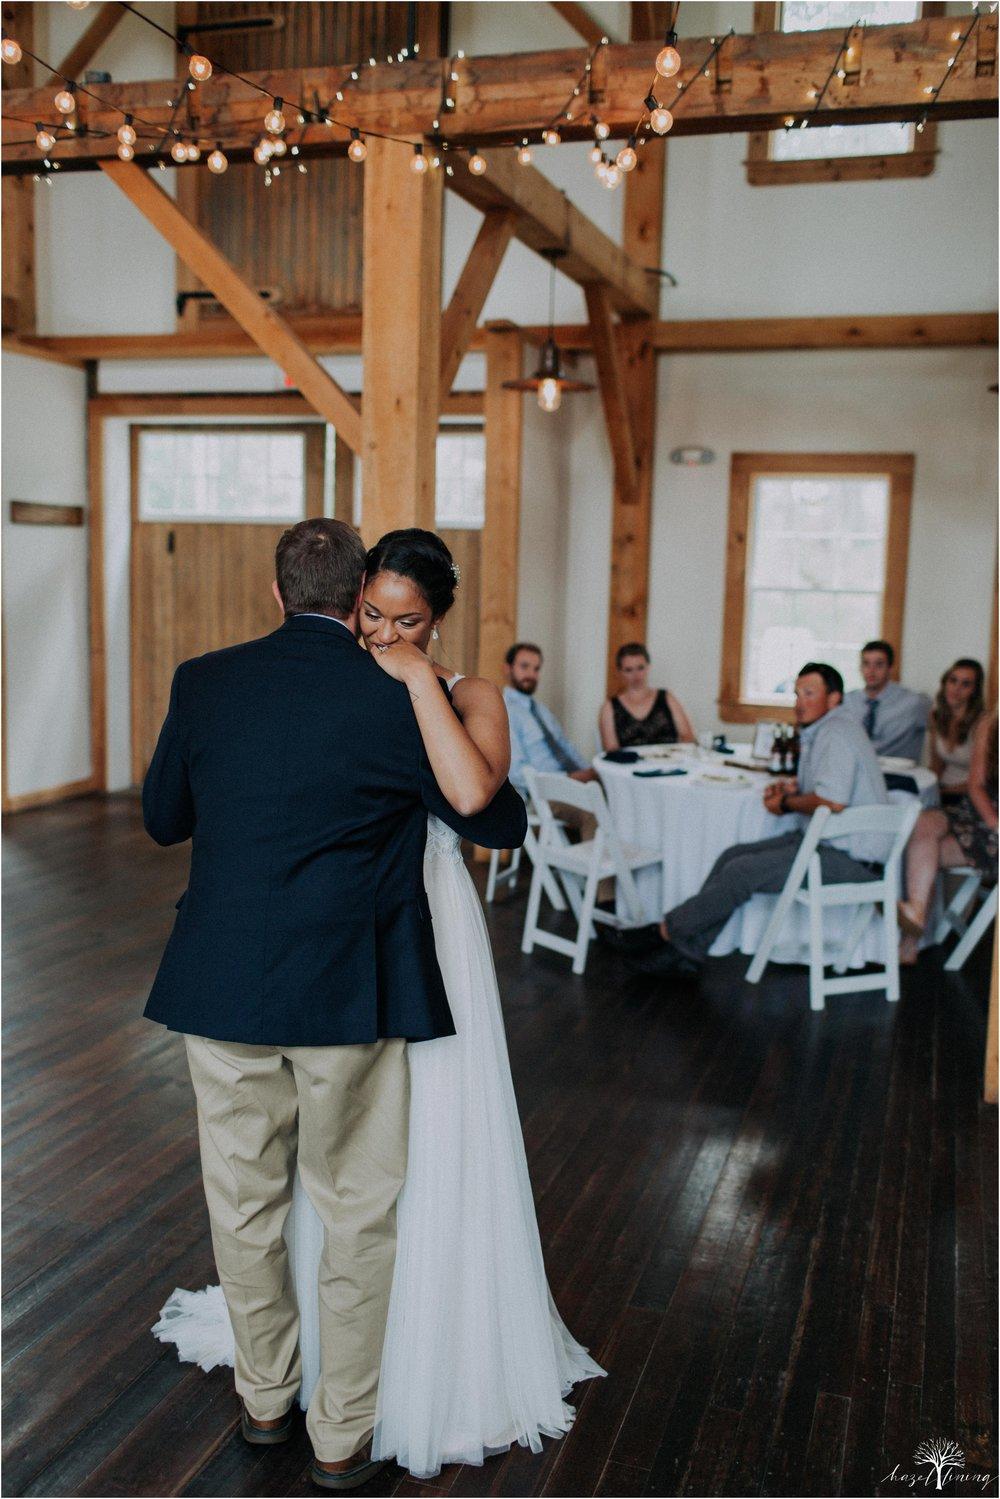 mariah-kreyling-samuel-sherratt-sherrattwiththeworld-peirce-farm-at-witch-hill-boston-massachusetts-wedding-photography-hazel-lining-travel-wedding-elopement-photography_0171.jpg